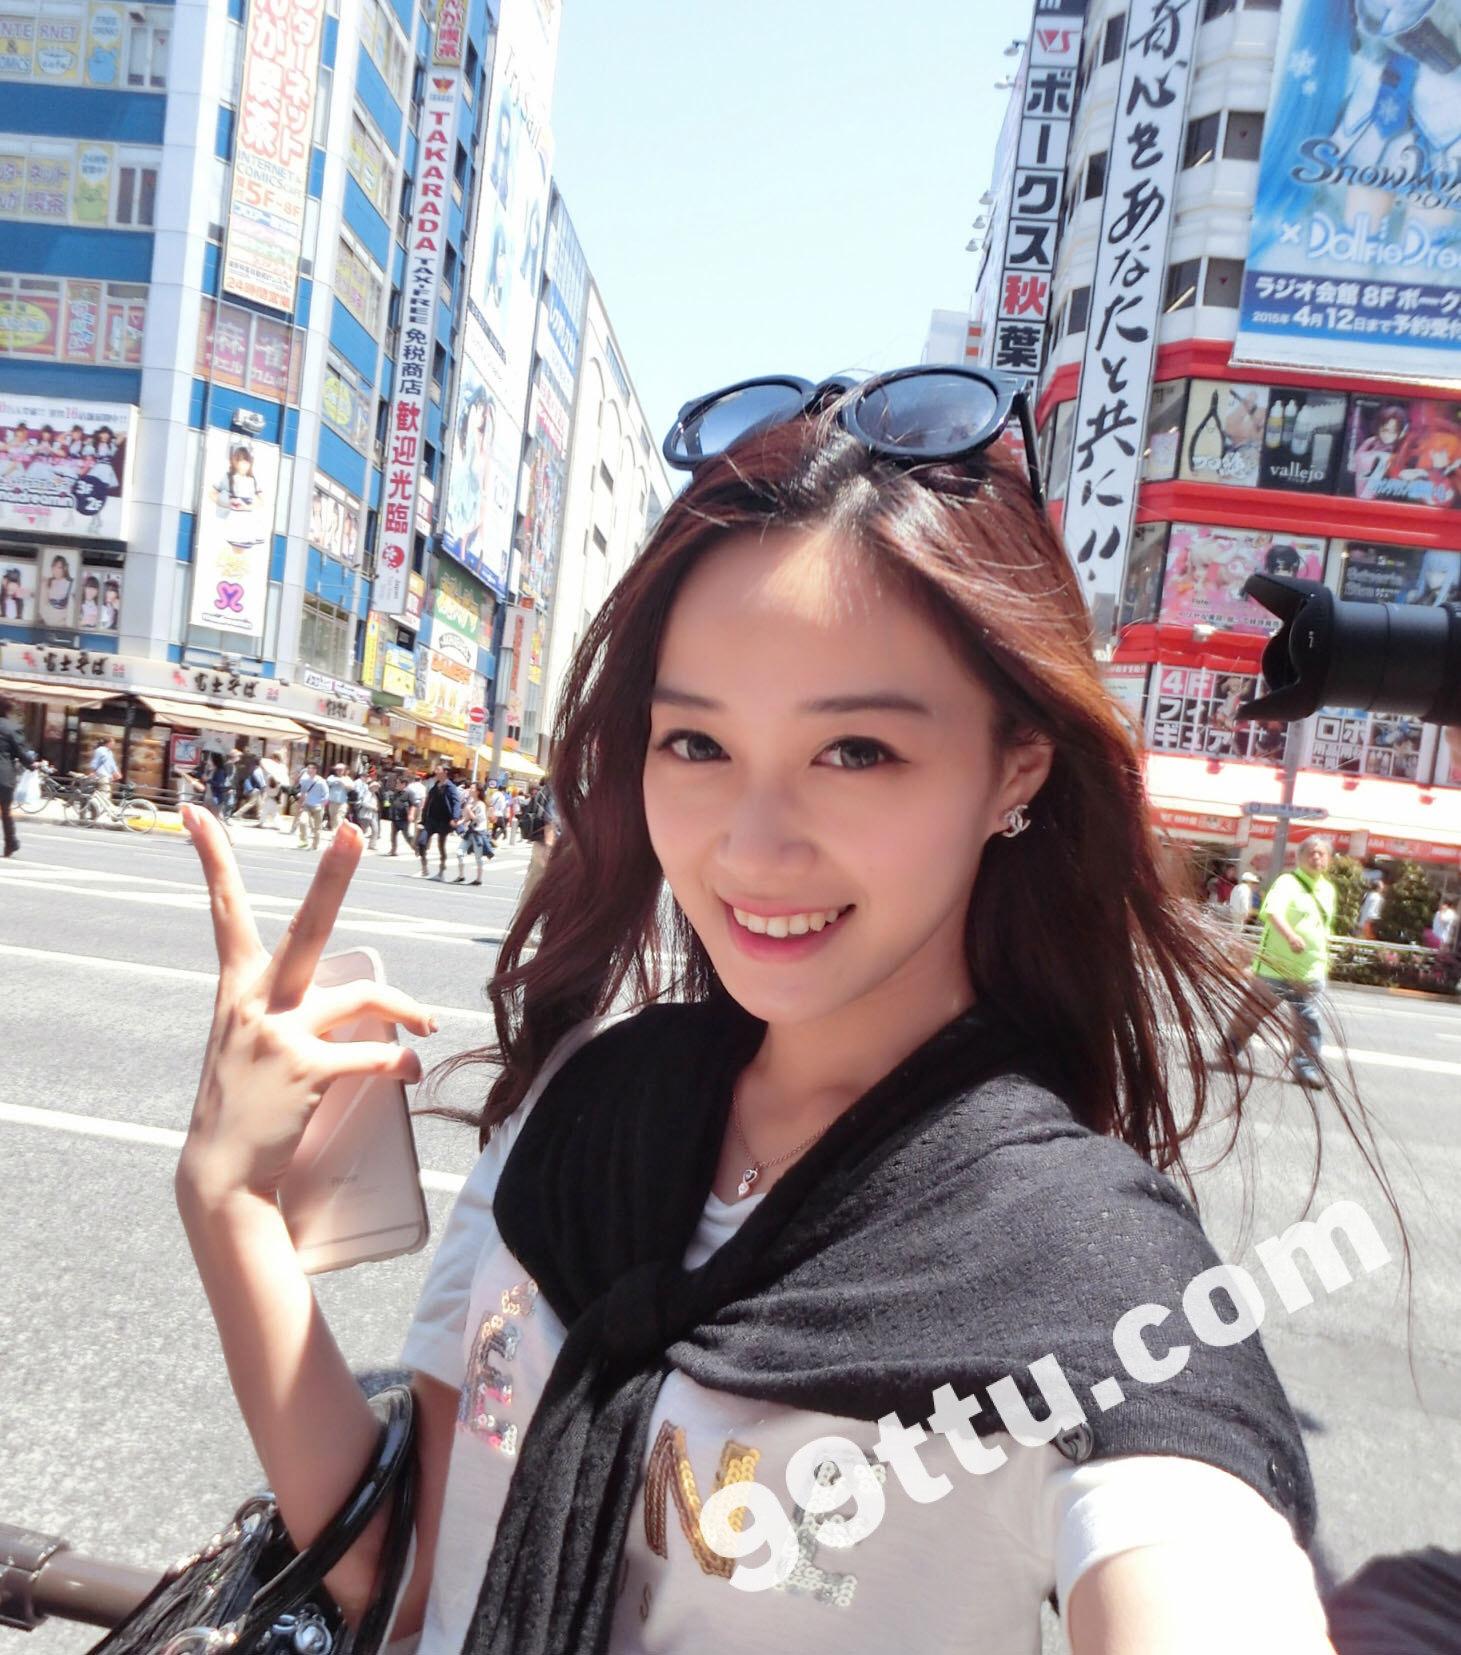 KK38 517张 时尚美女达人照片生活照-7